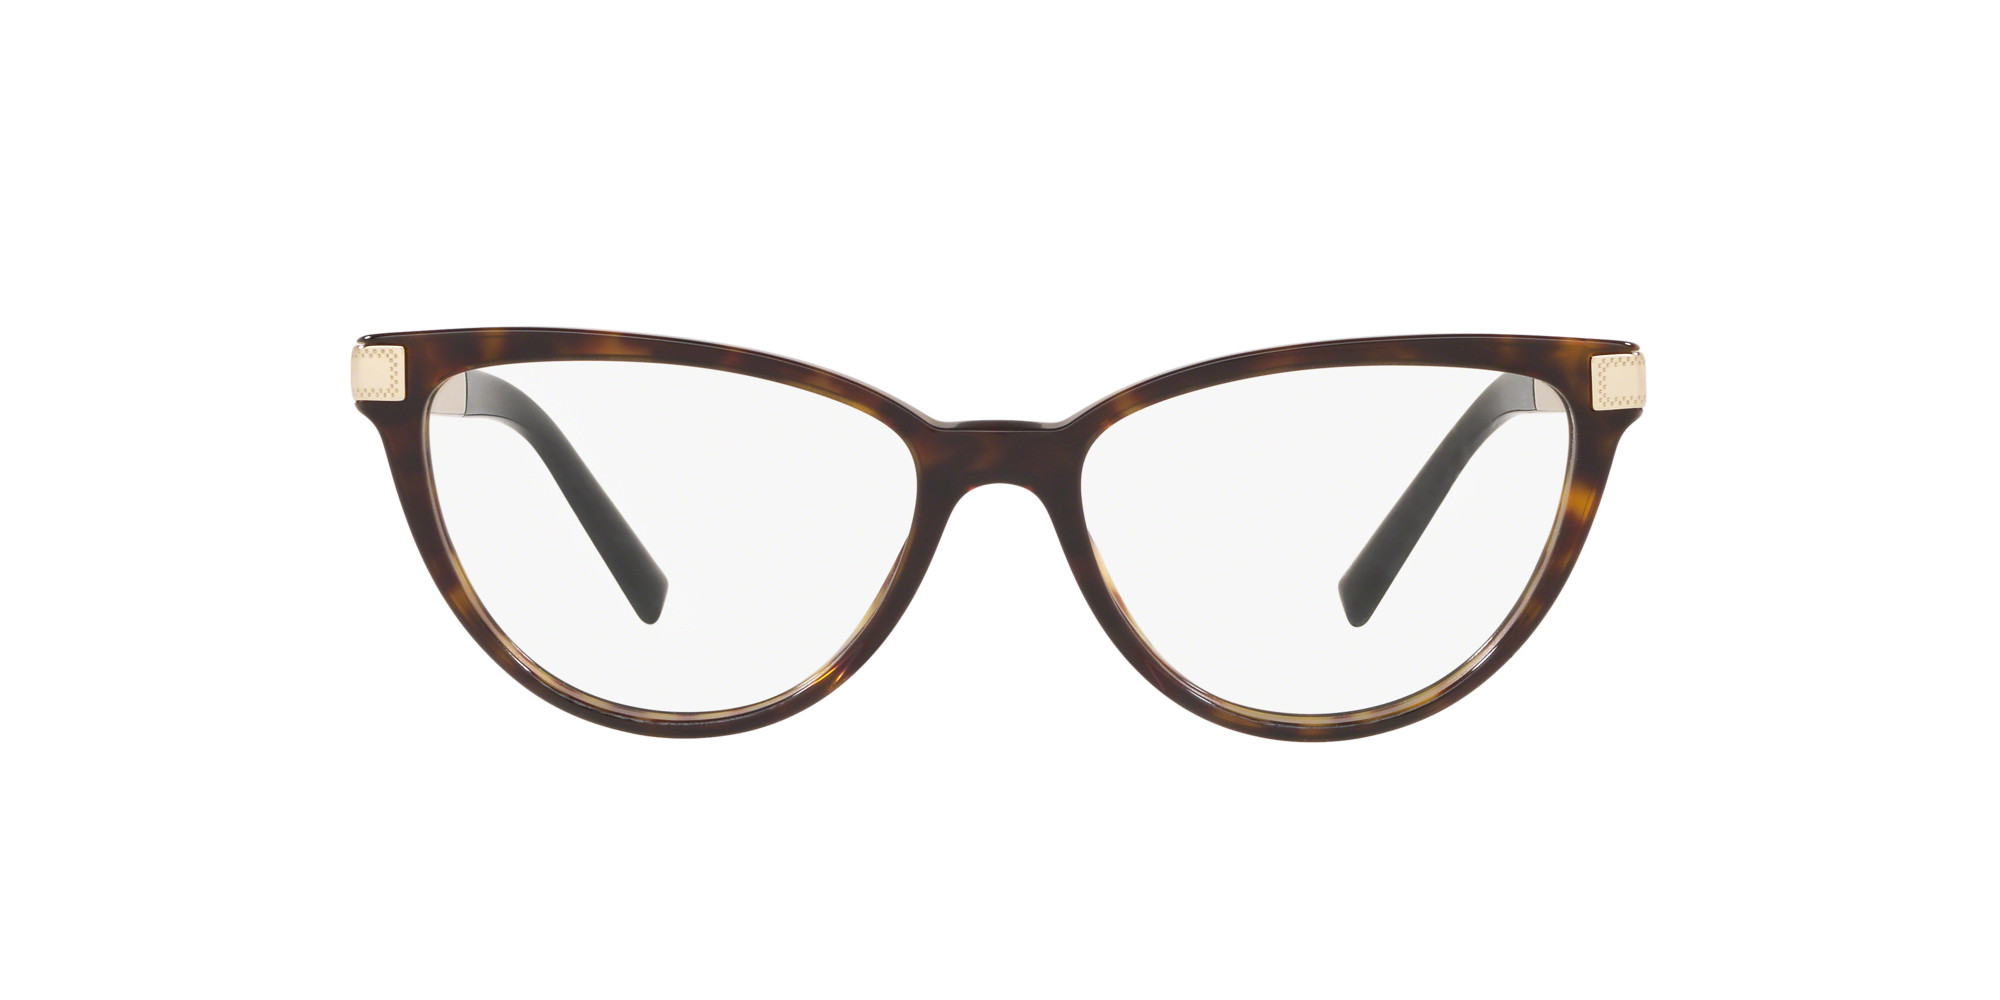 Image for VE3271 from LensCrafters | Glasses, Prescription Glasses Online, Eyewear